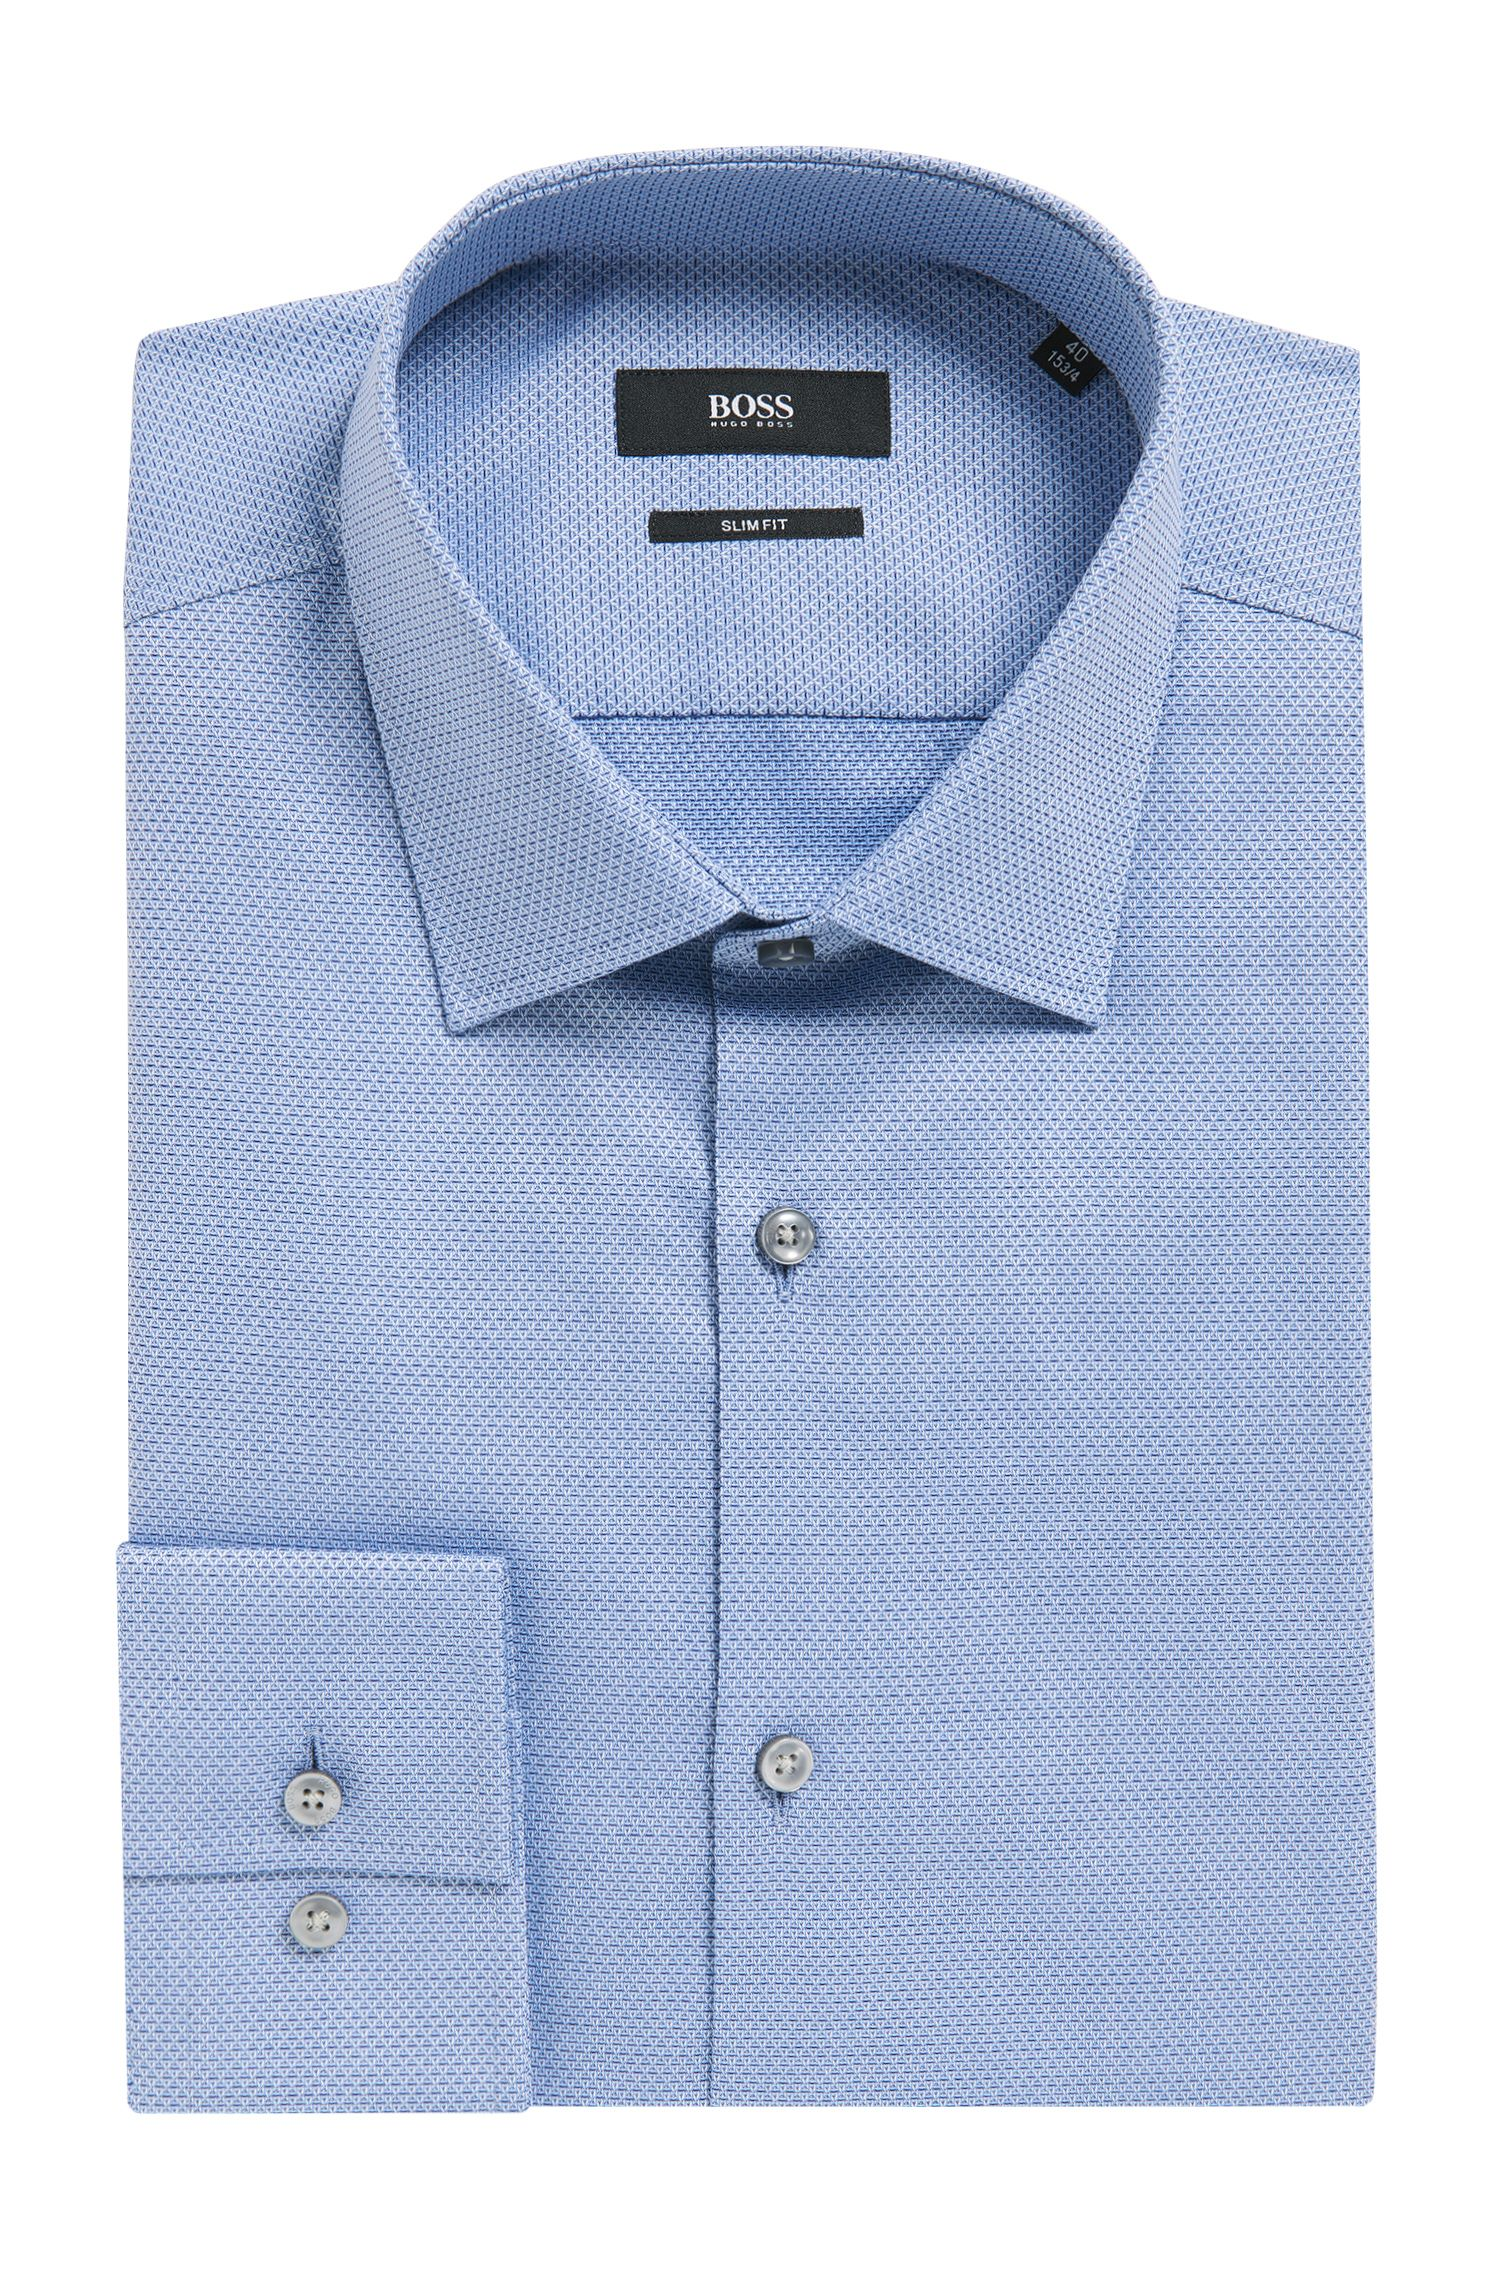 Diamond Print Cotton Dress Shirt, Slim Fit | Jenno